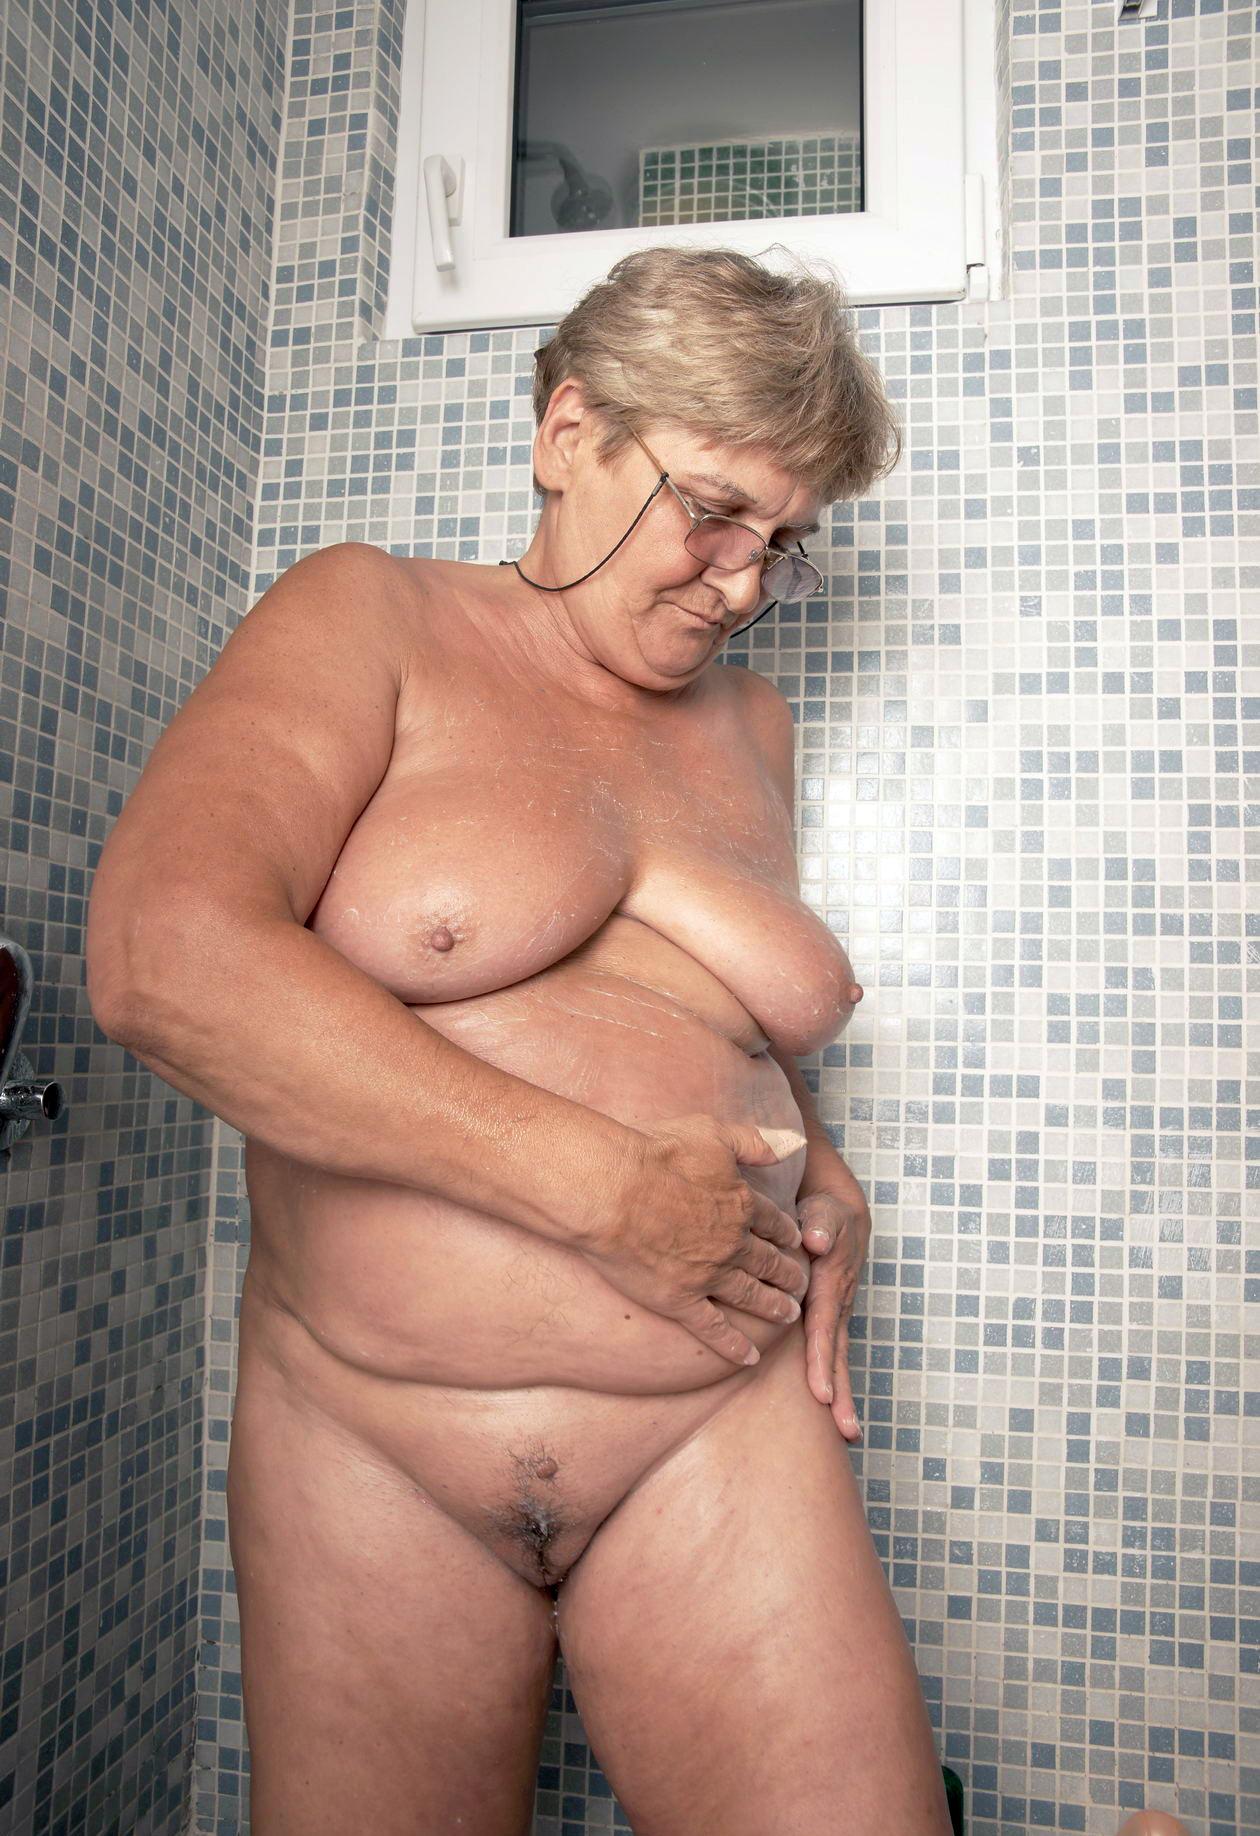 vids Nude gran